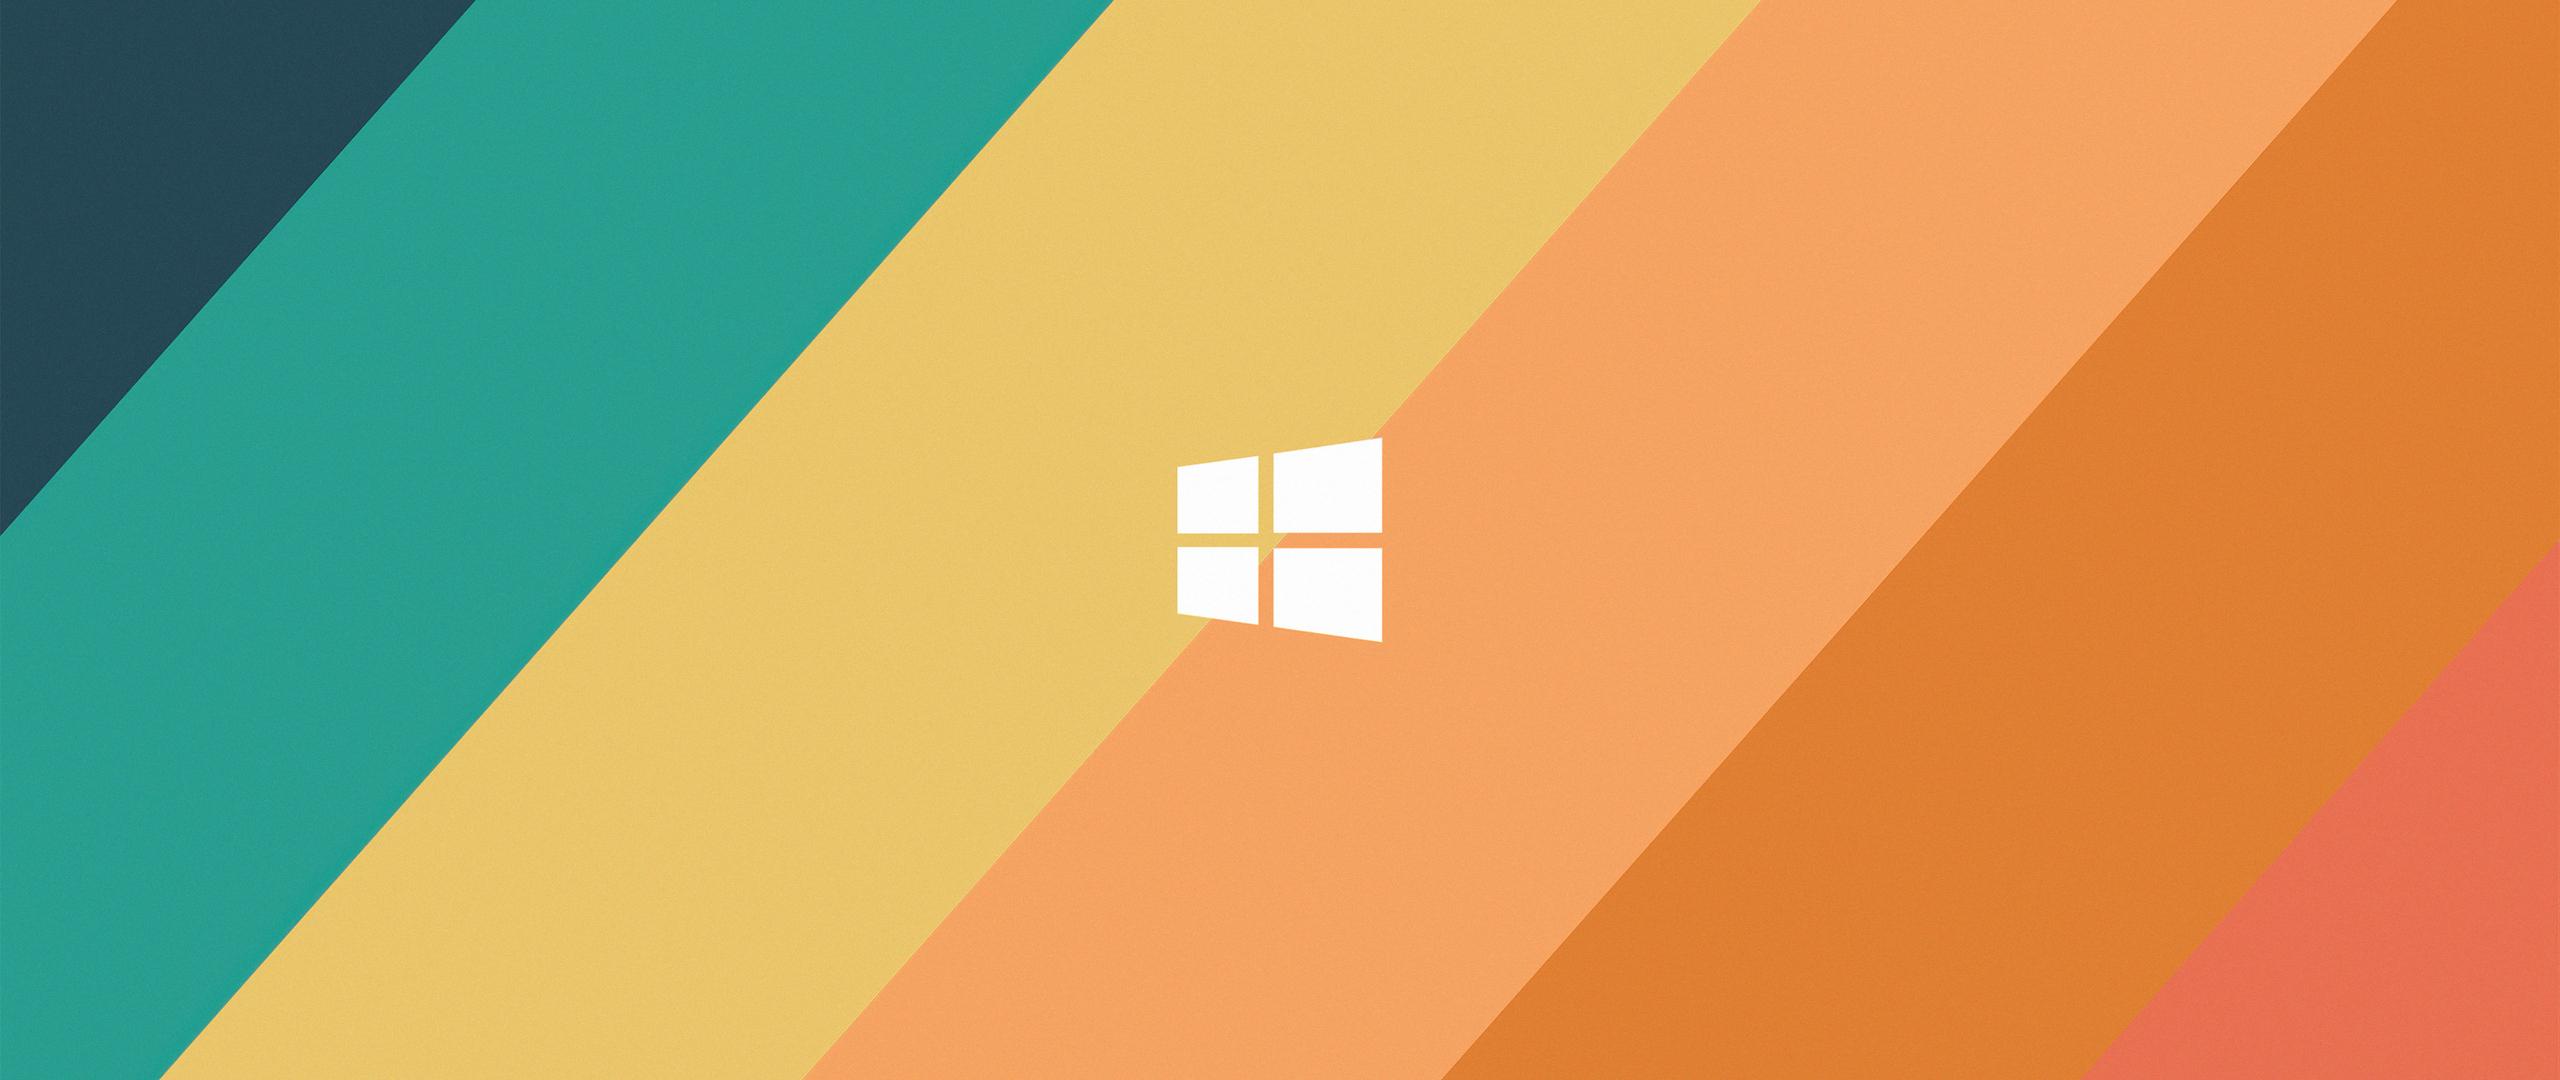 windows-inc-minimalism-4k-nc.jpg